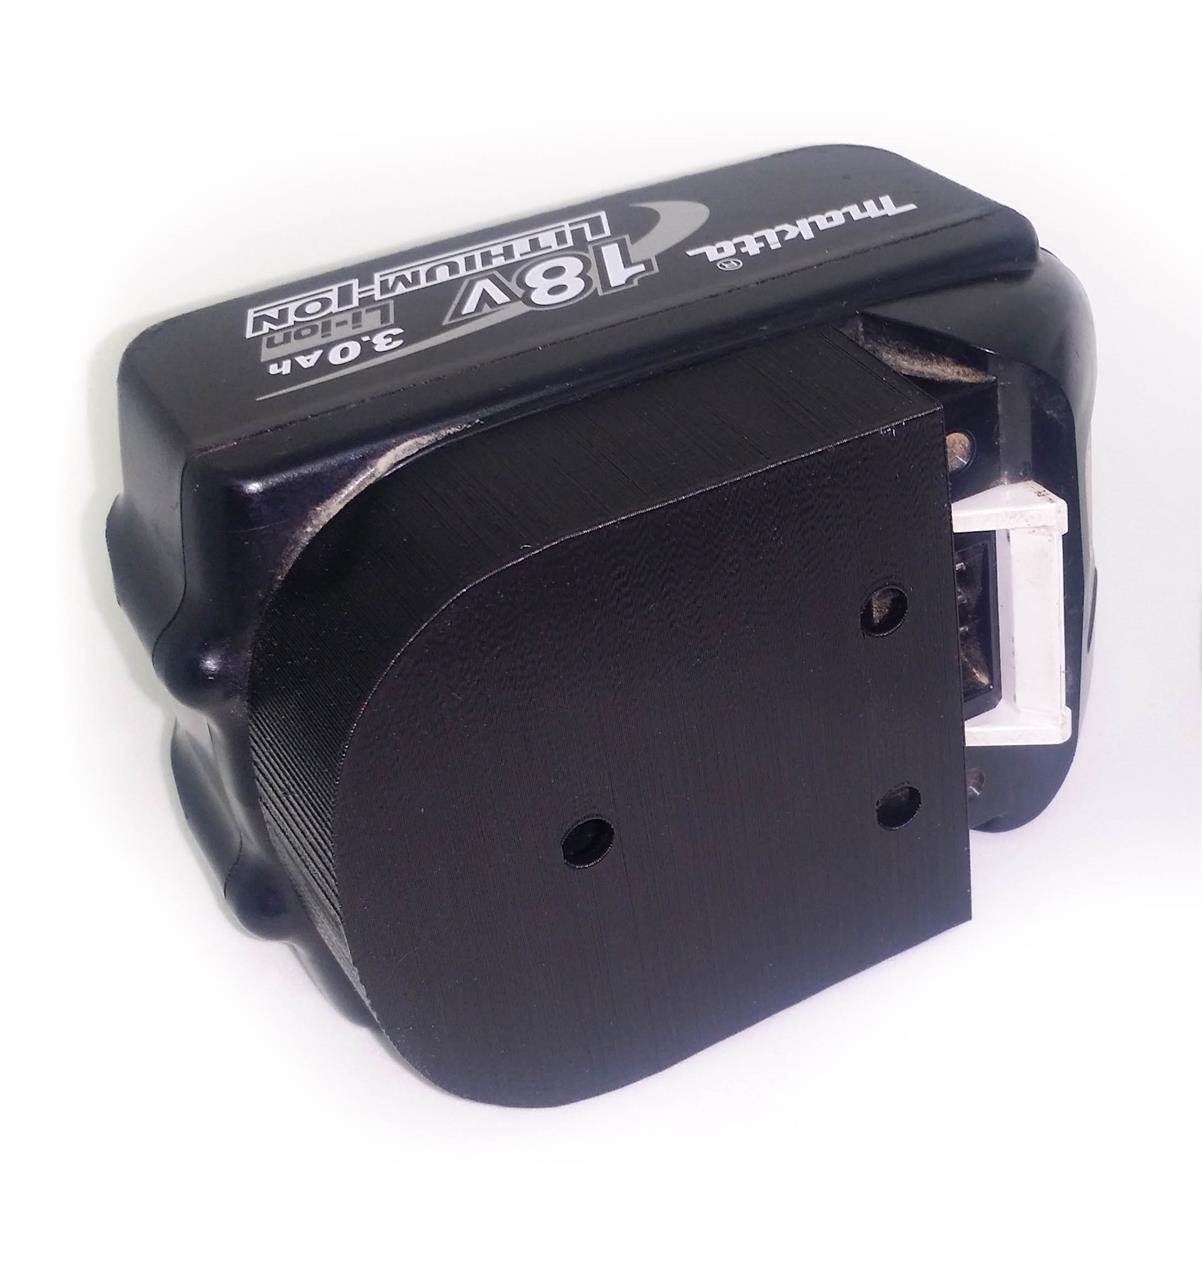 Makita 18V batteriholder